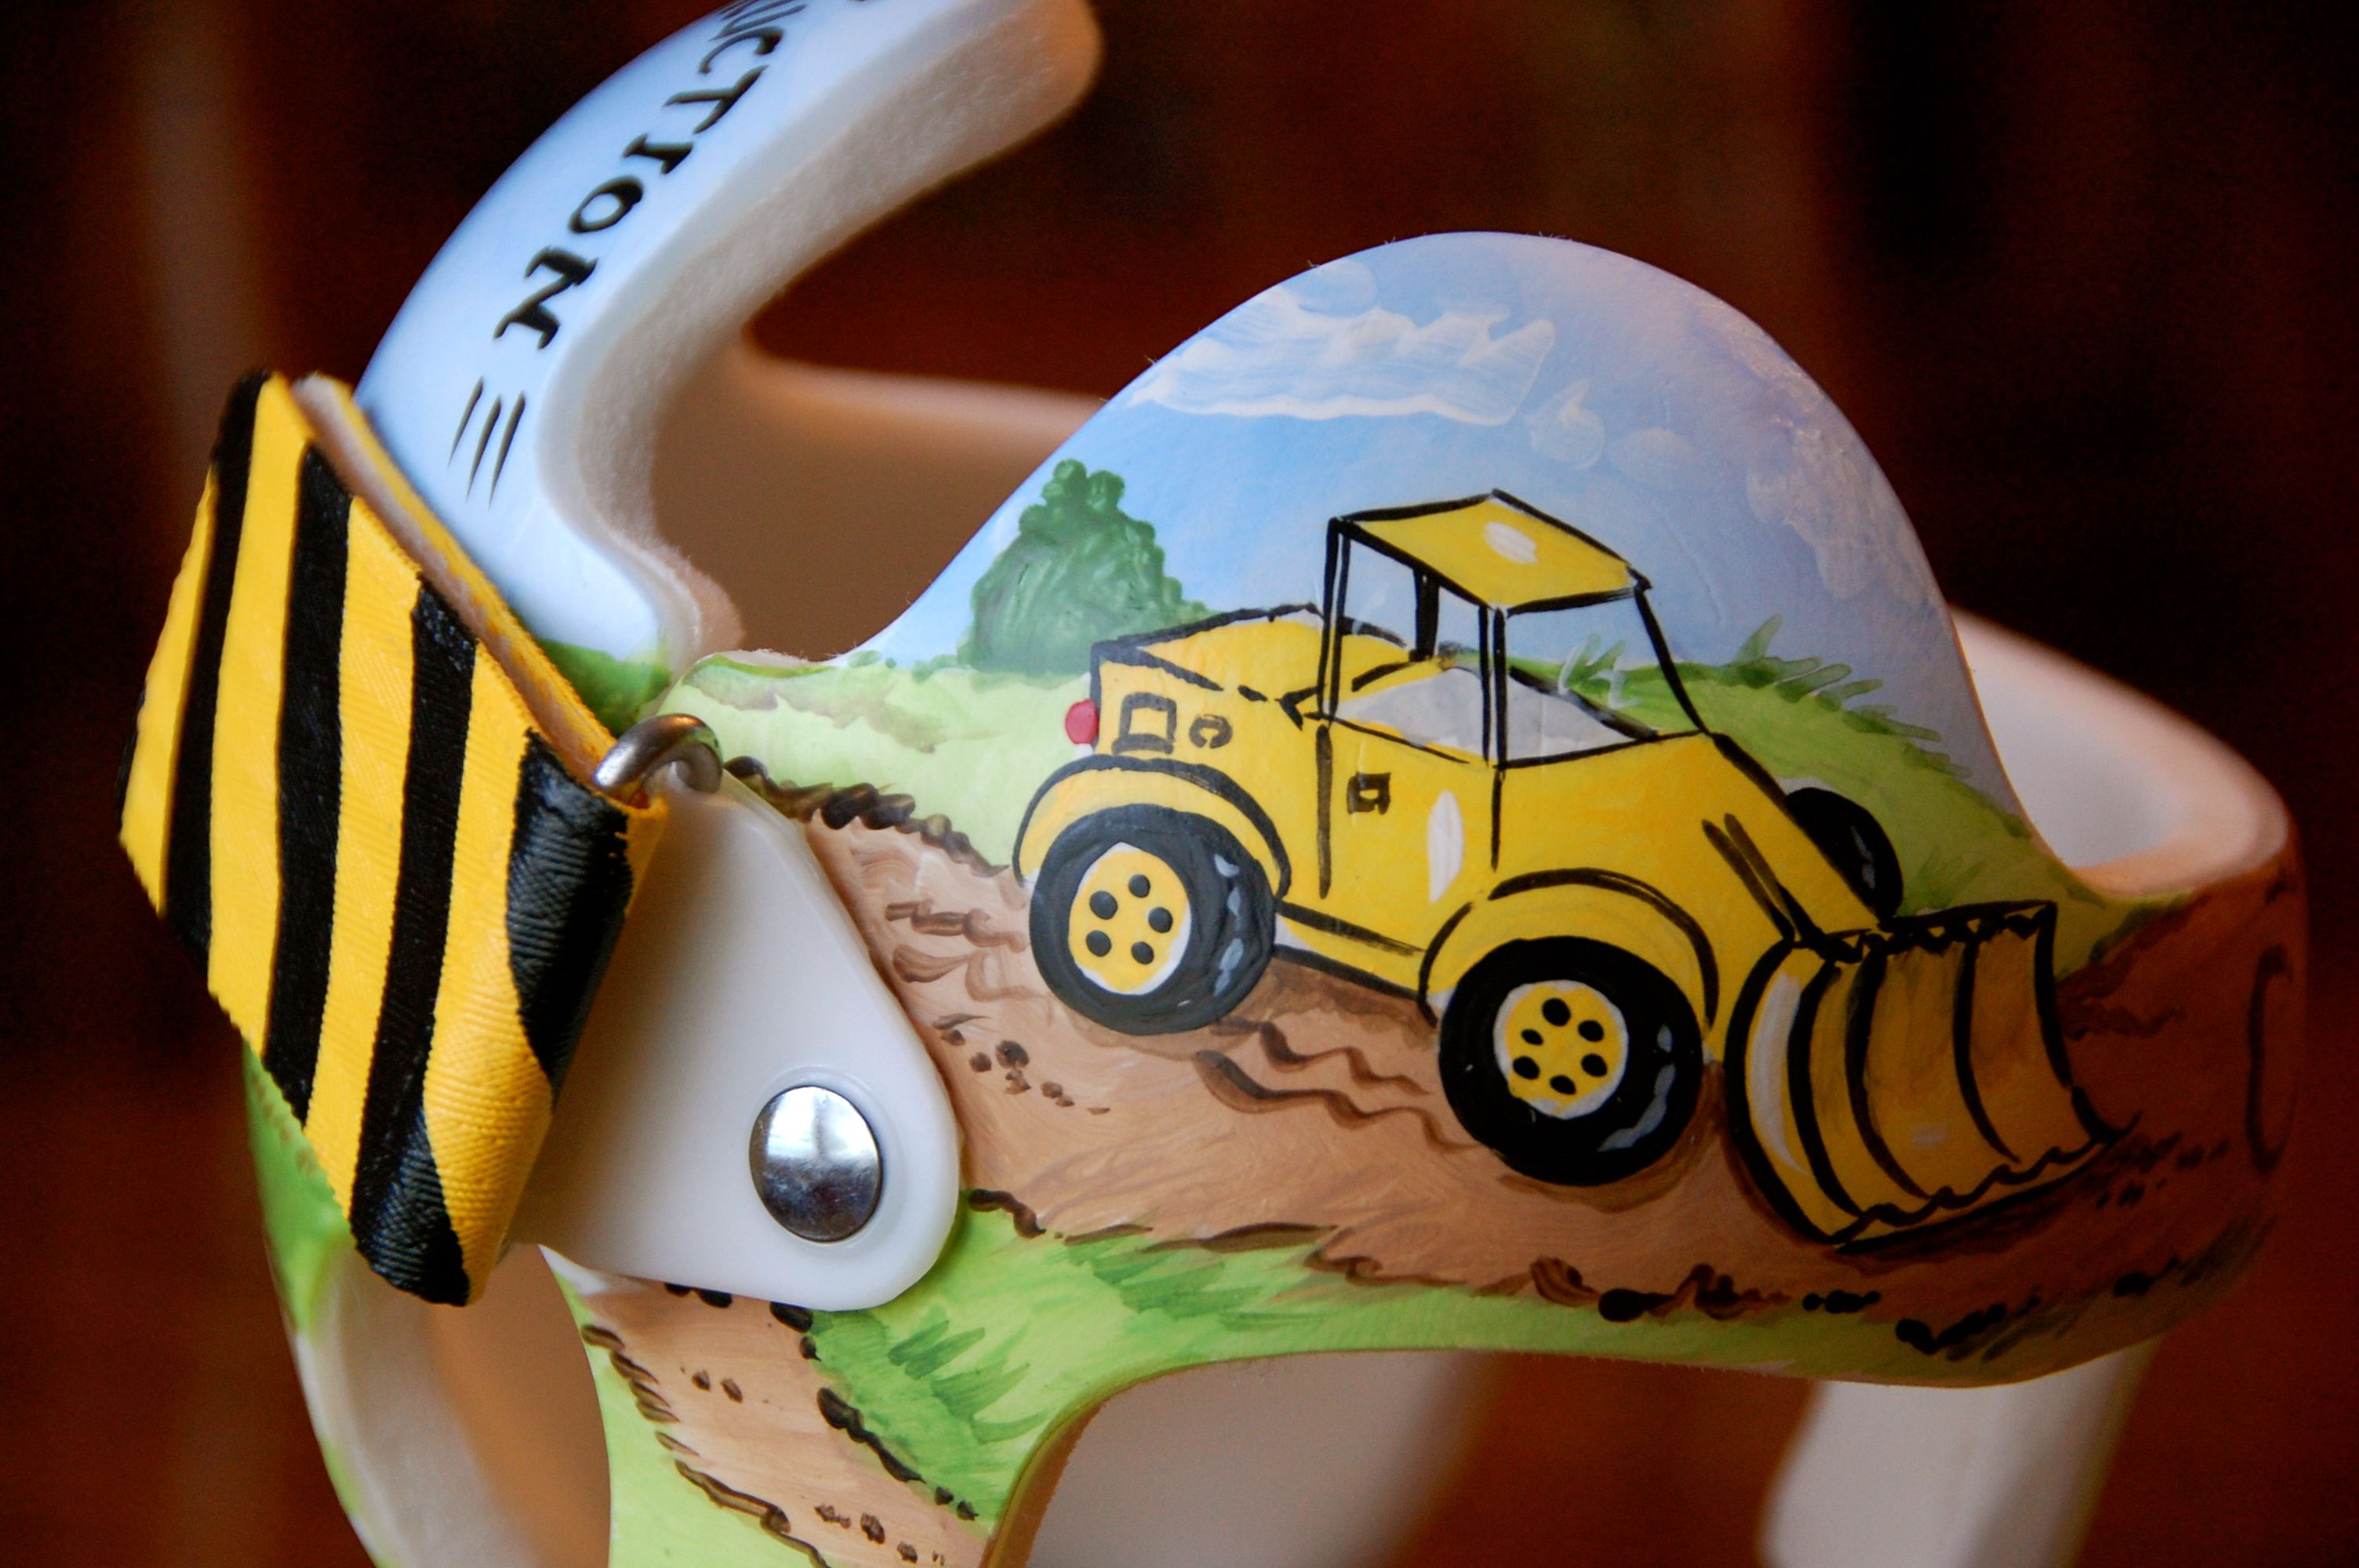 Construction Zone Cranial Band Cranial Bands Helmets